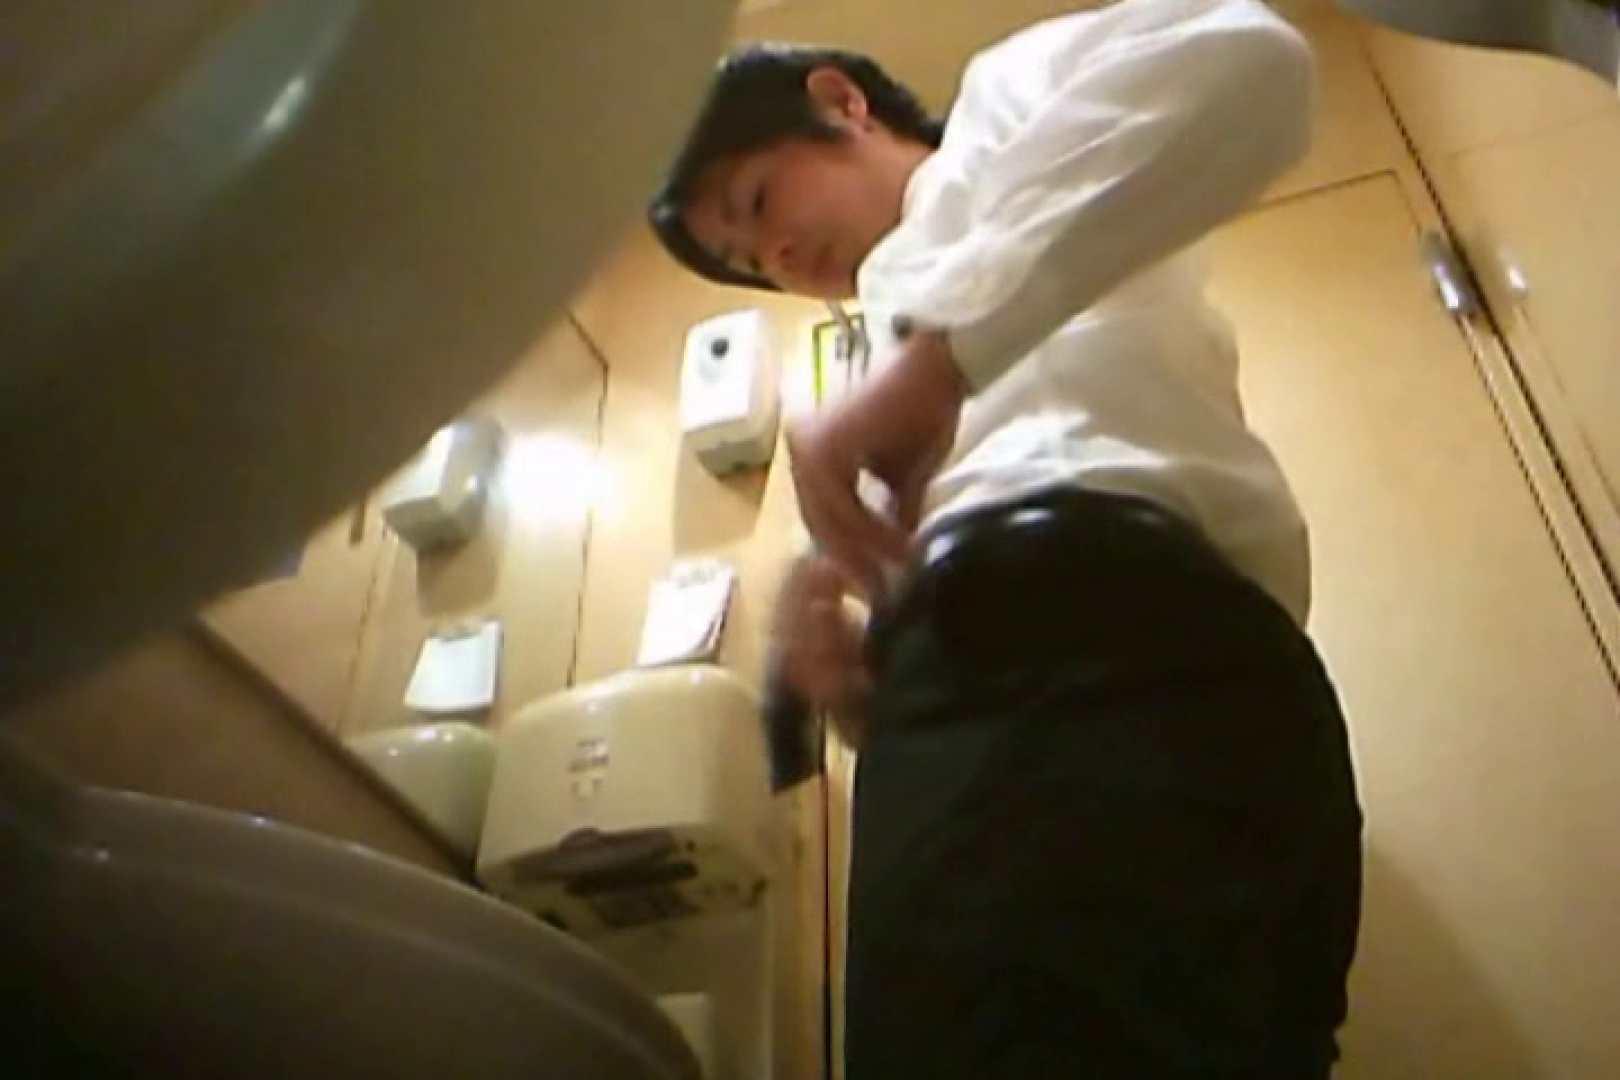 SEASON 3rd!掴み取りさんの洗面所覗き!in新幹線!VOL.20 私服 ゲイ射精画像 96連発 83